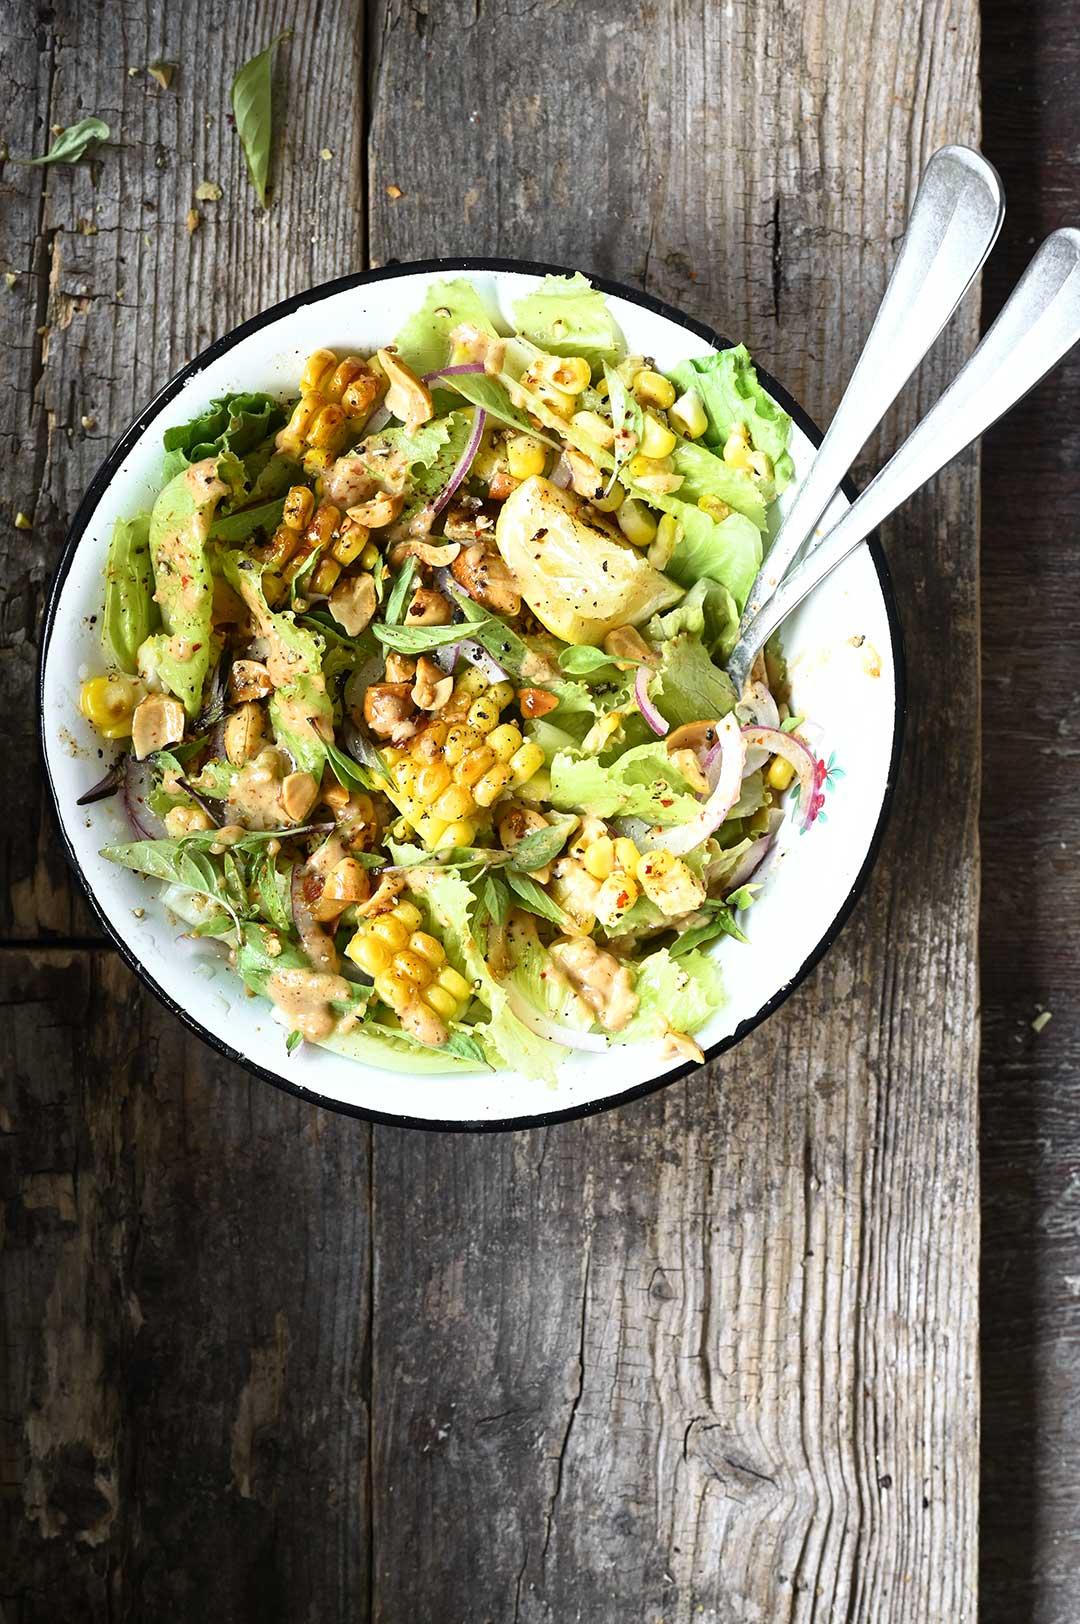 serving dumplings | corn salad with spicy peanut dressing